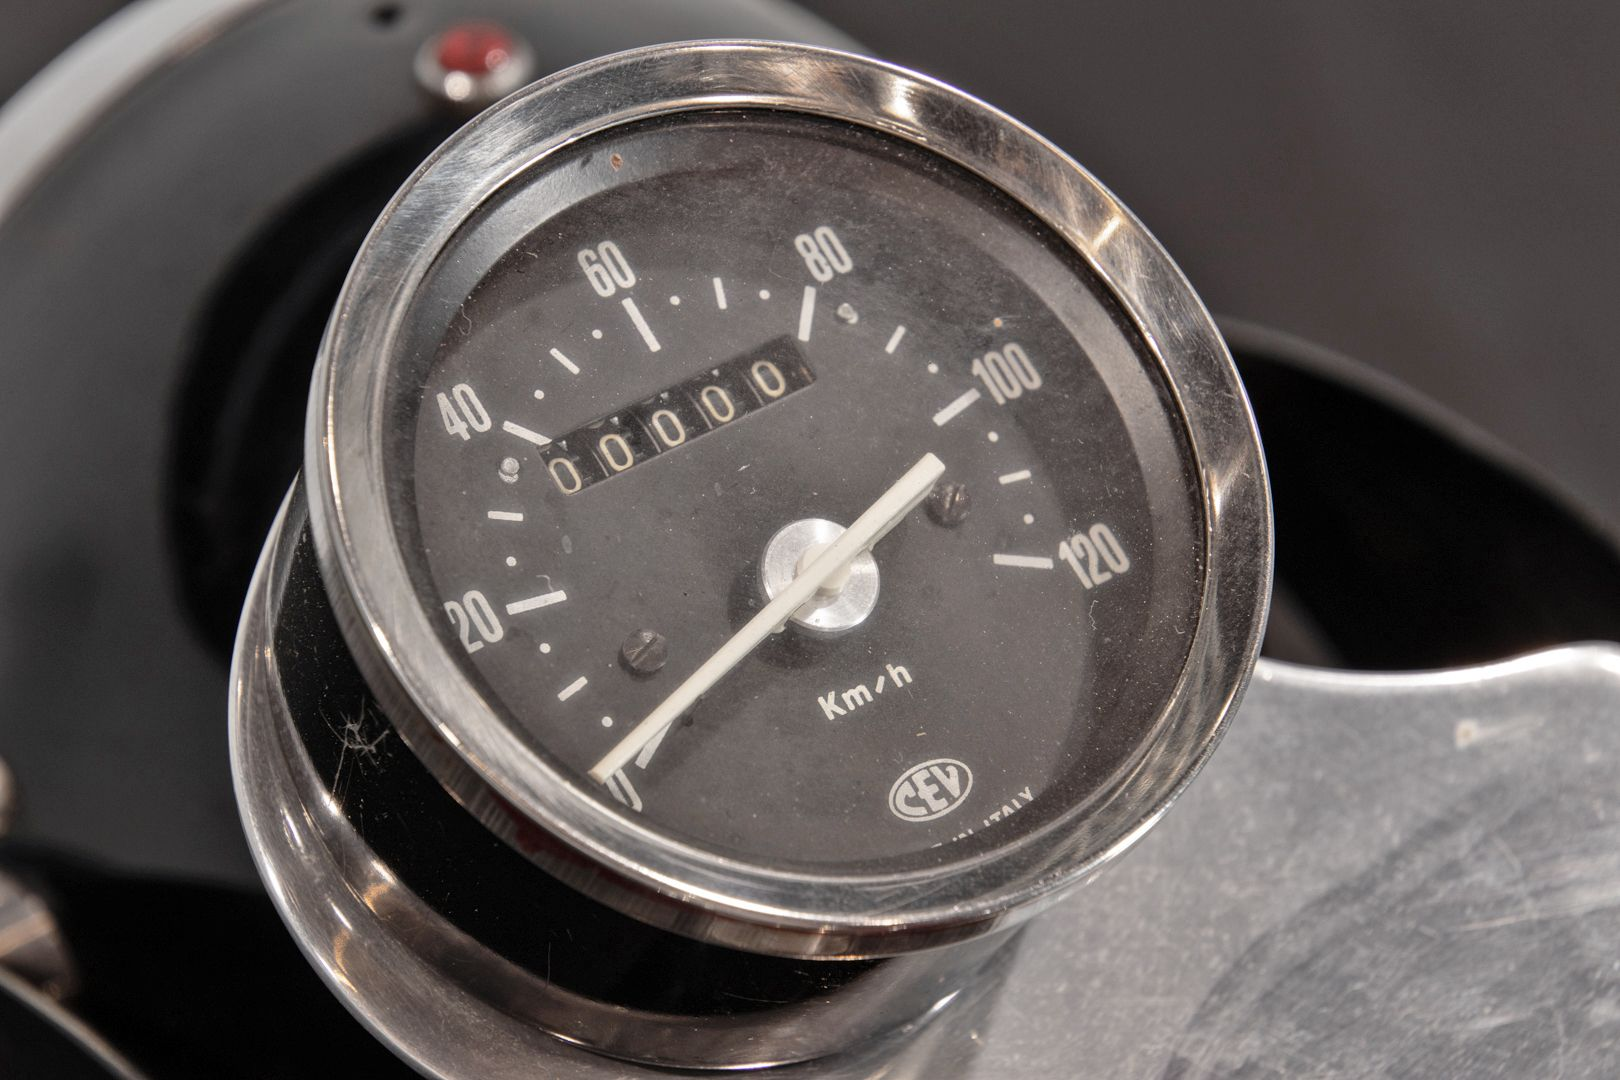 1952 Gilera Nettuno Sport 250 34608